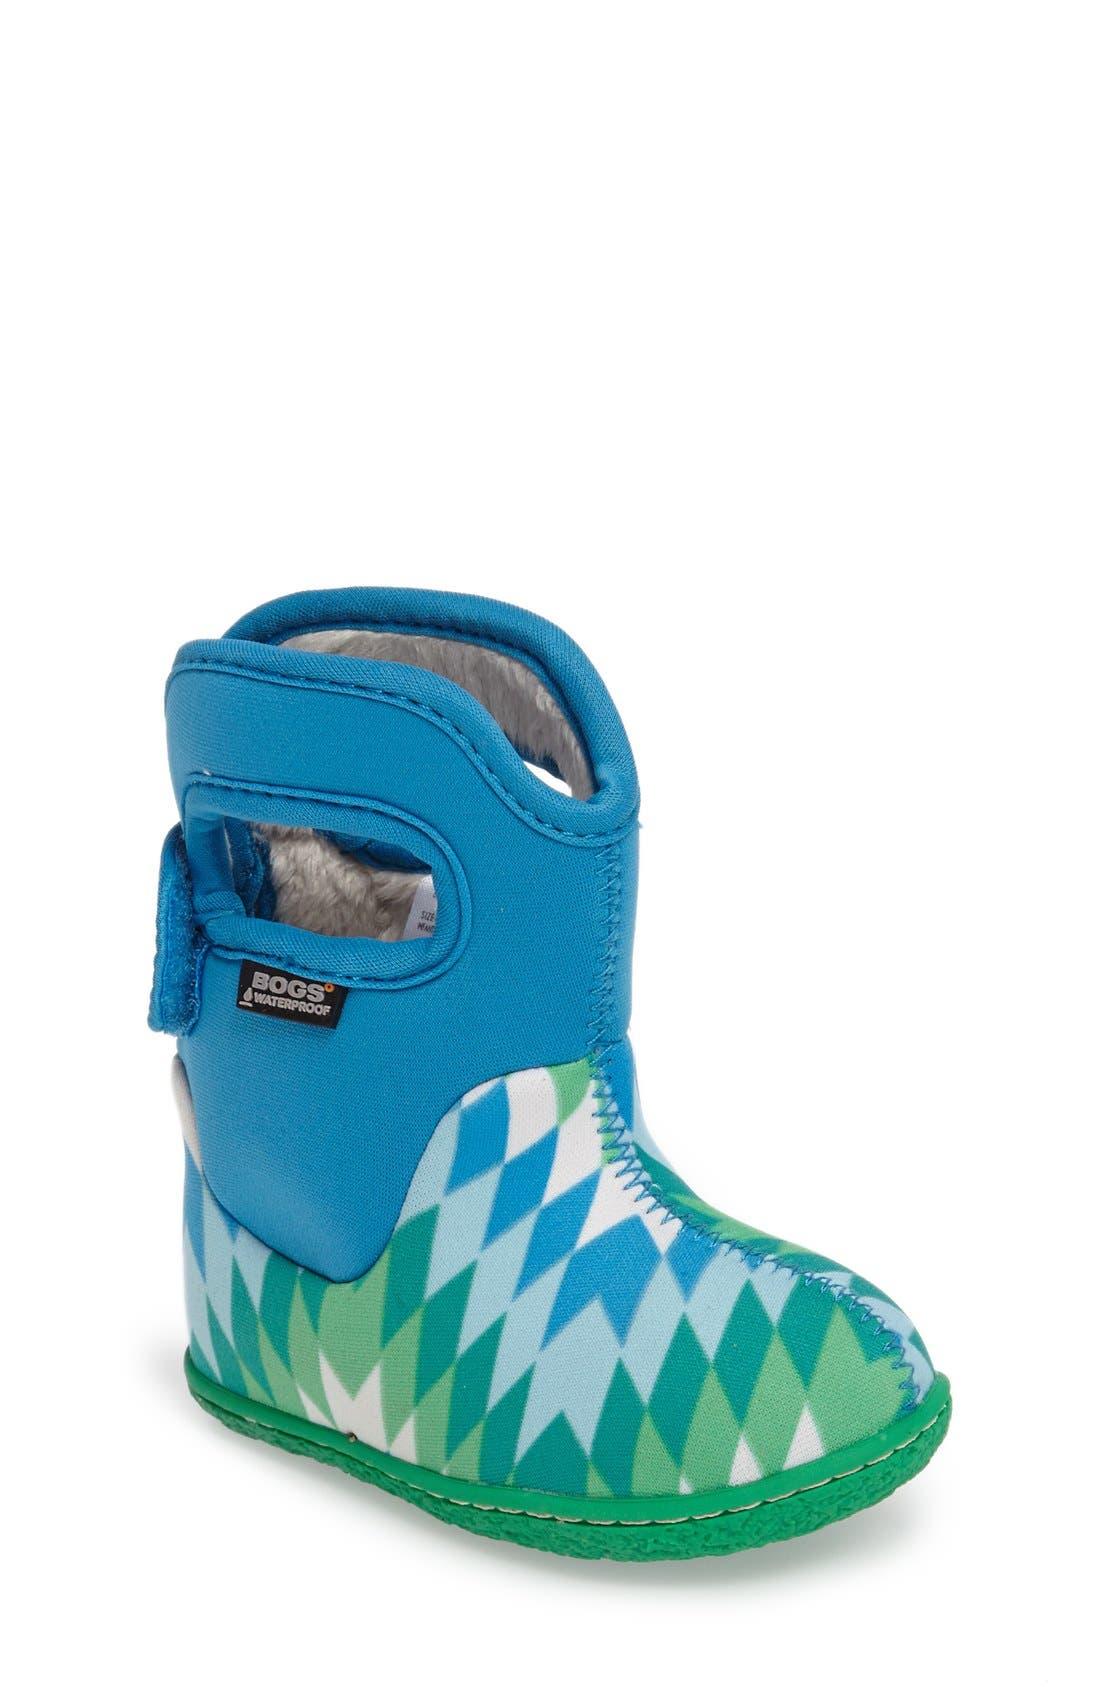 Main Image - Bogs 'Classic' Waterproof Snow Boot (Baby, Walker & Toddler)